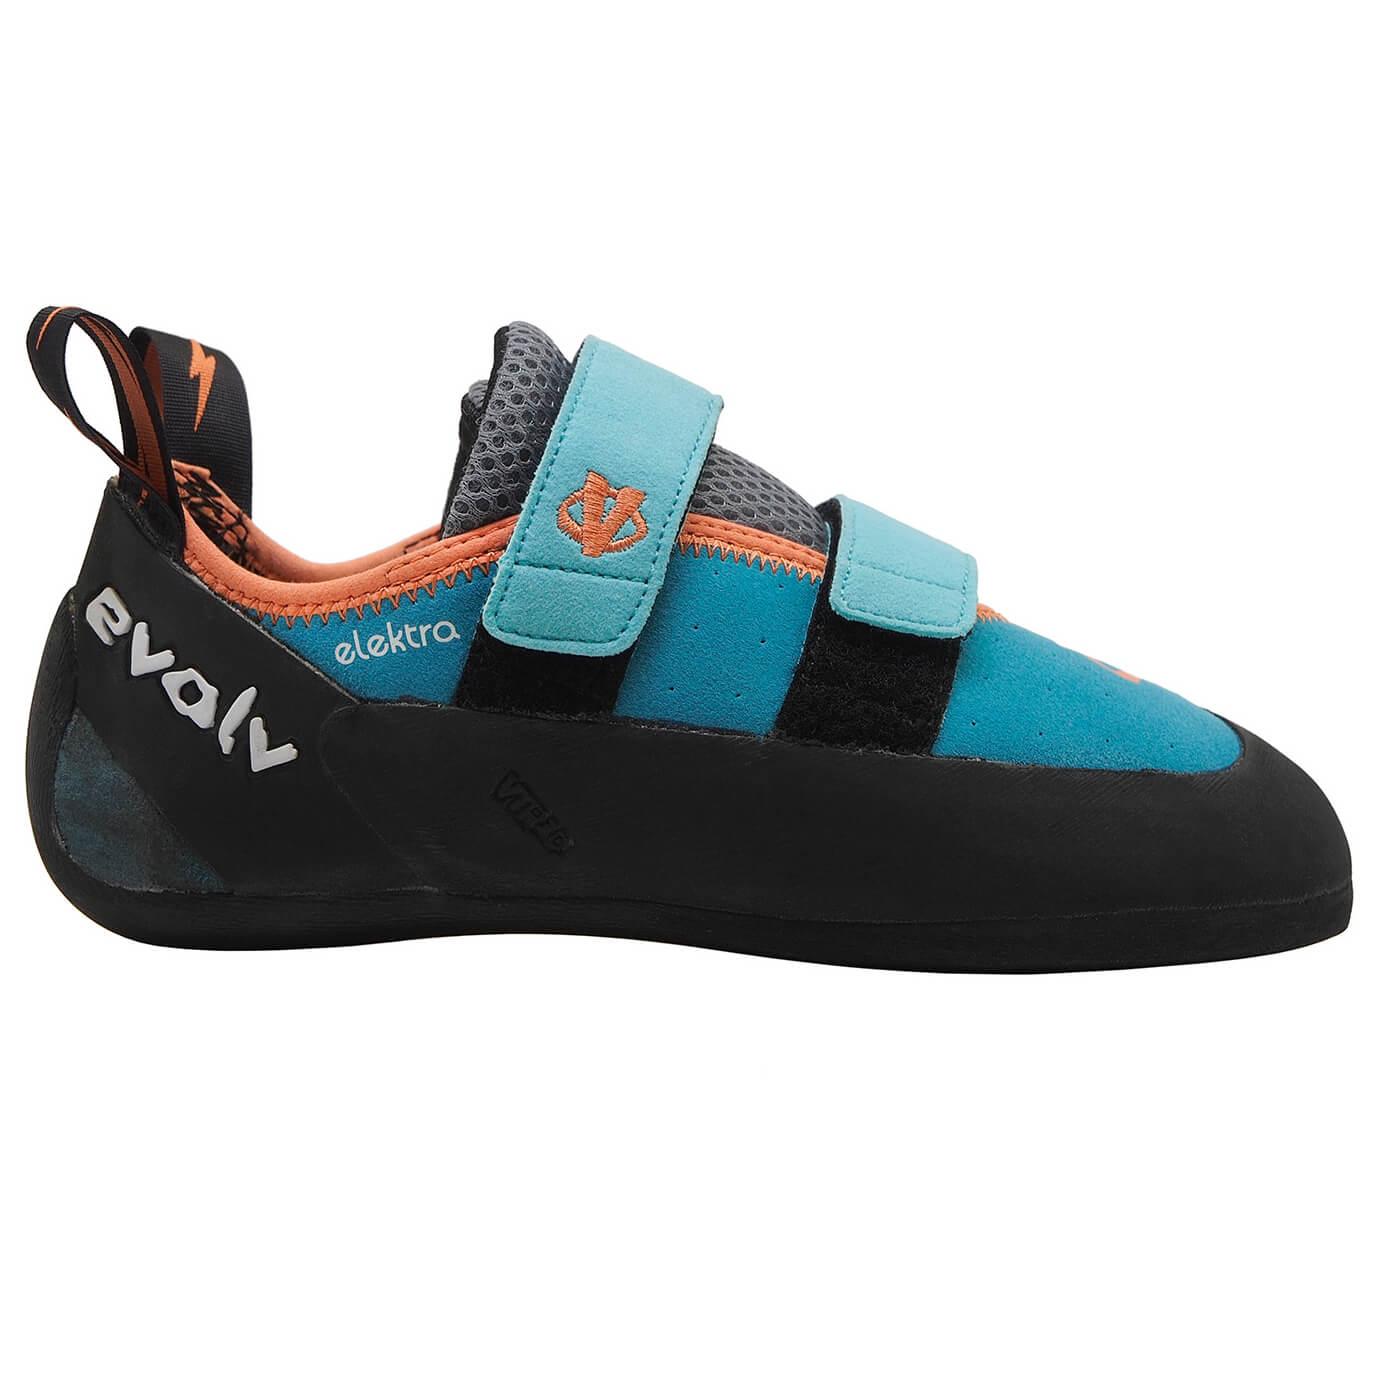 Evolve Womens Elektra Climbing Shoes